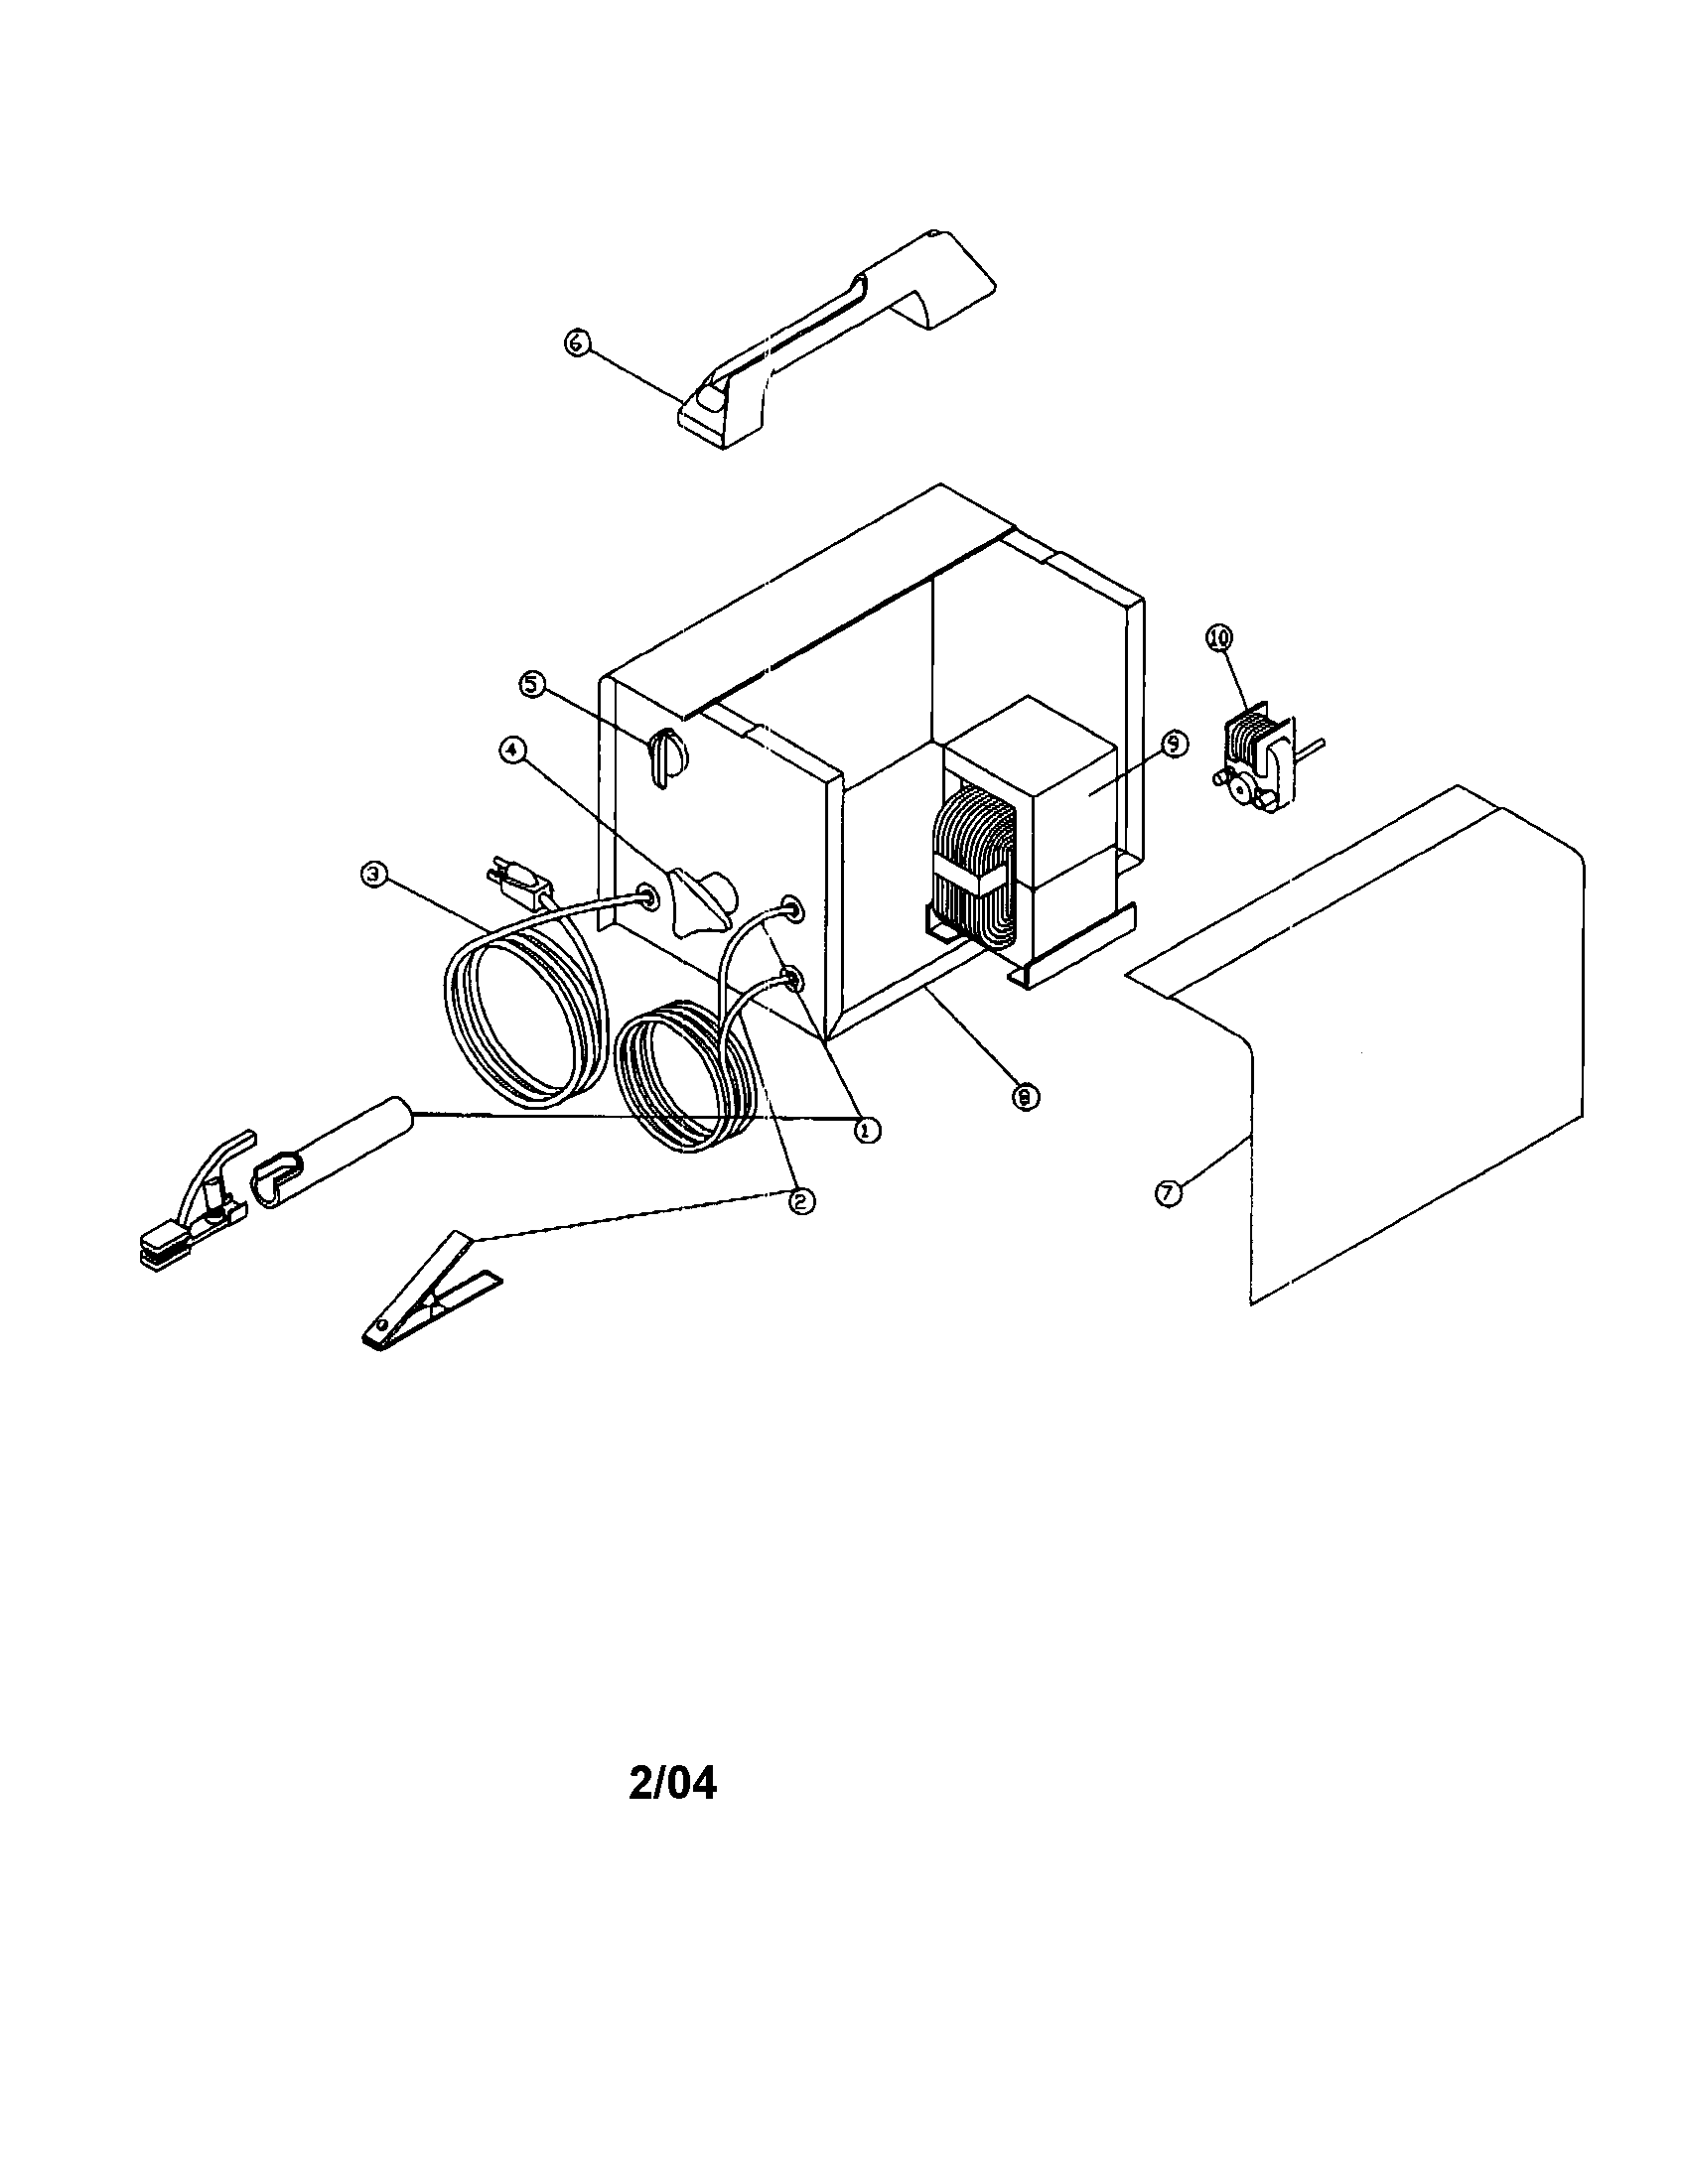 century welder parts diagram word problems using venn diagrams 100 amp model 110130 sears